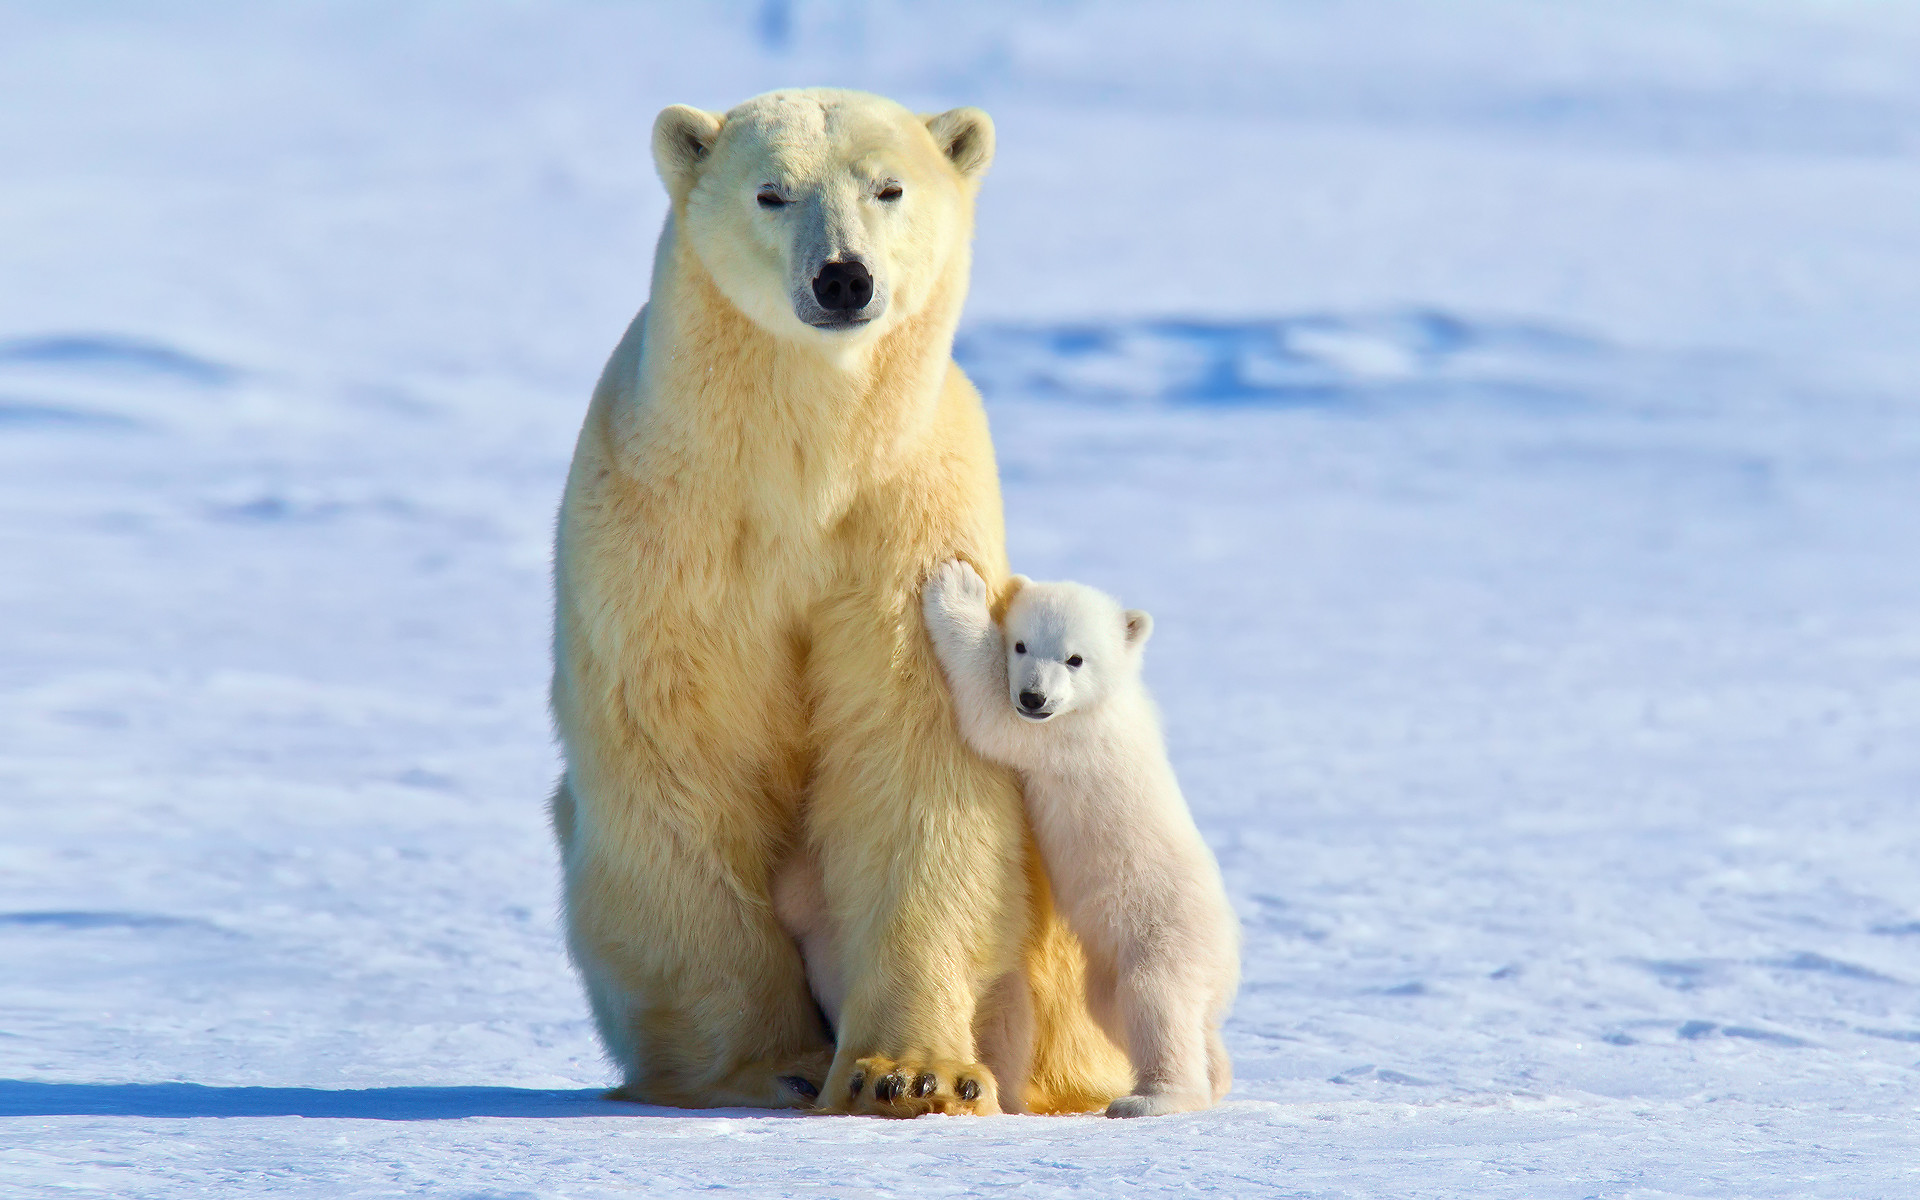 polar animals snow ice bear baby fauna bears arctic animal tundra desktop wallpapers wildlife backgrounds terrestrial mobile resolution px background